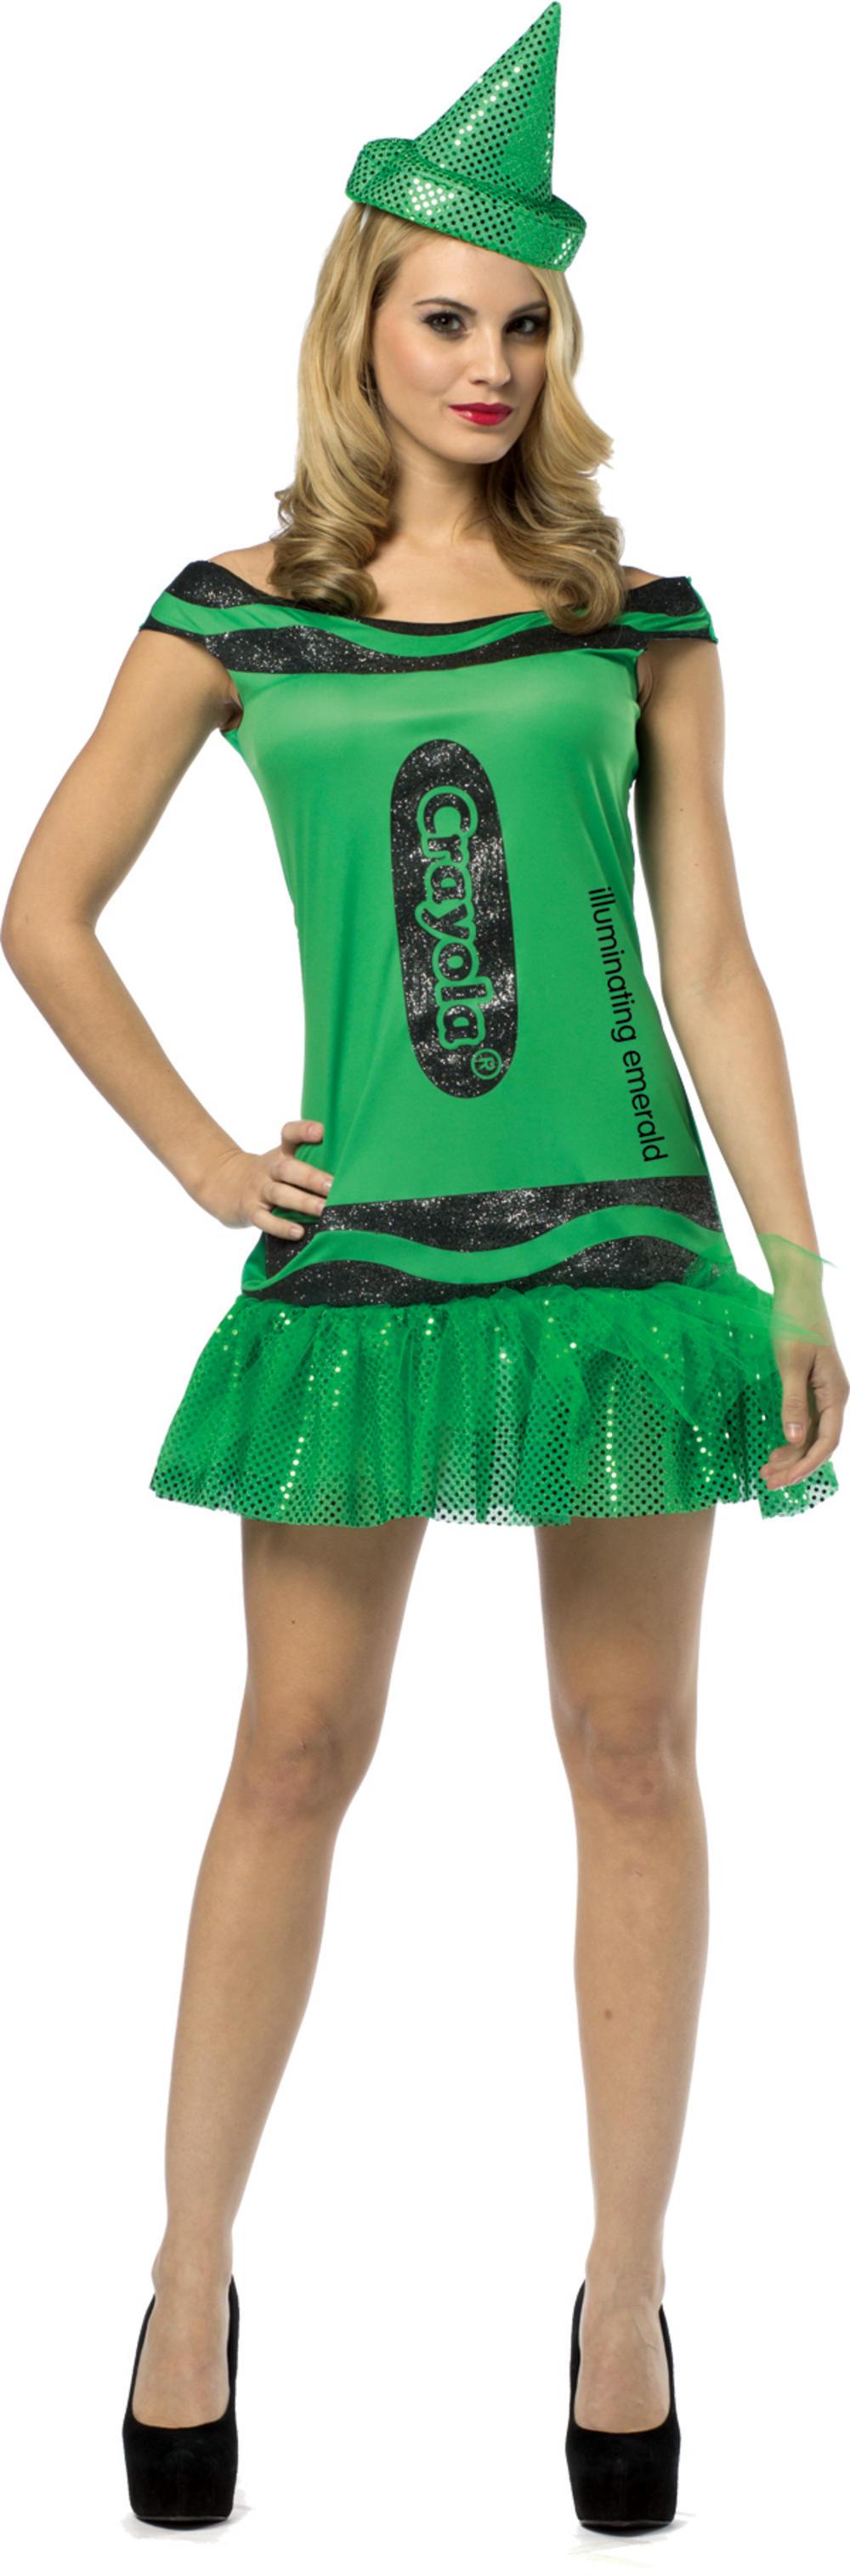 Emerald Green Crayola Glitter Dress Ladies Costume